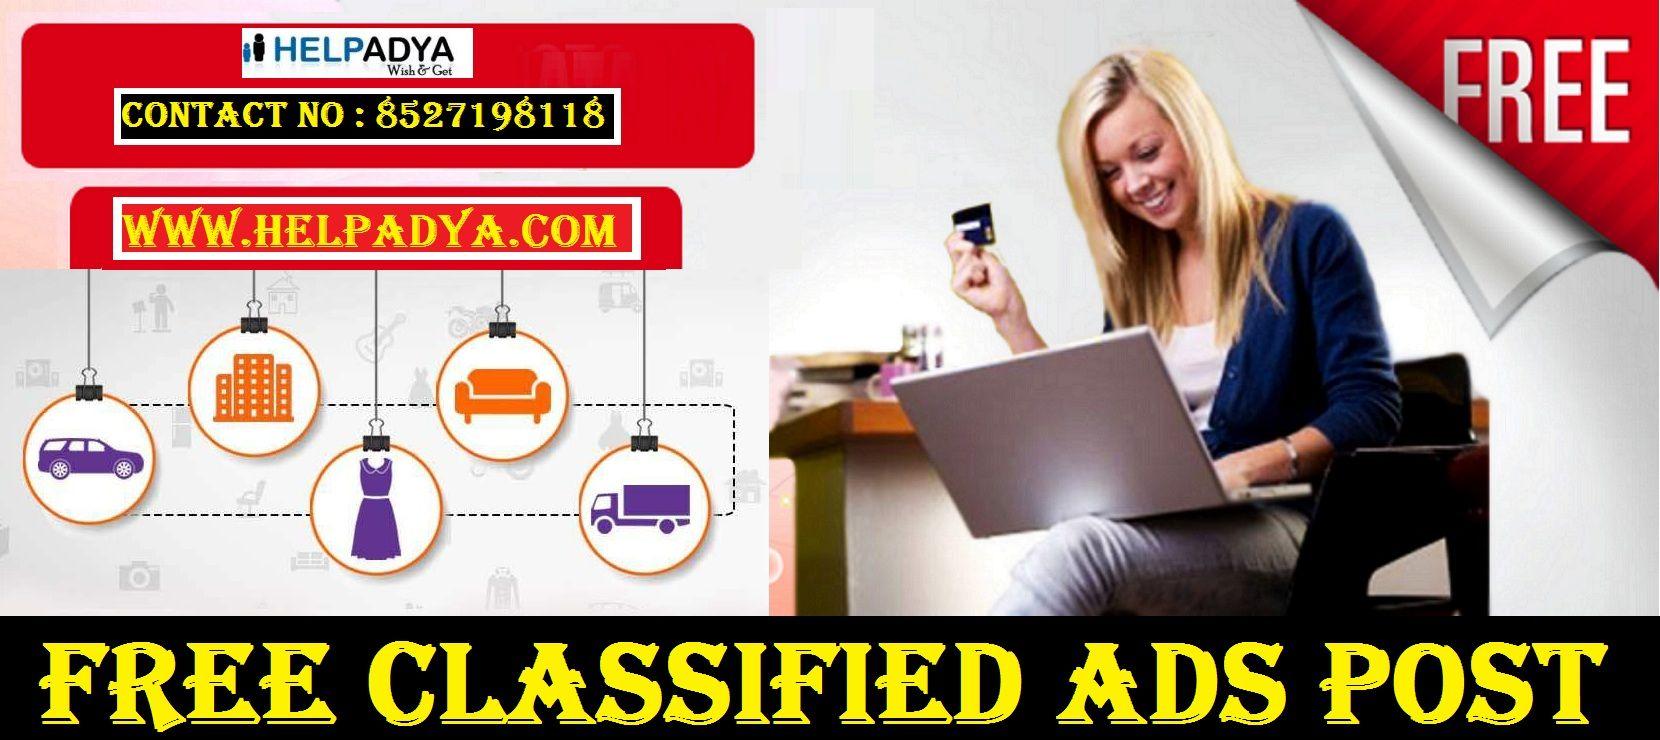 Free Classified Ads Post By Help Adya Free Classified Ads